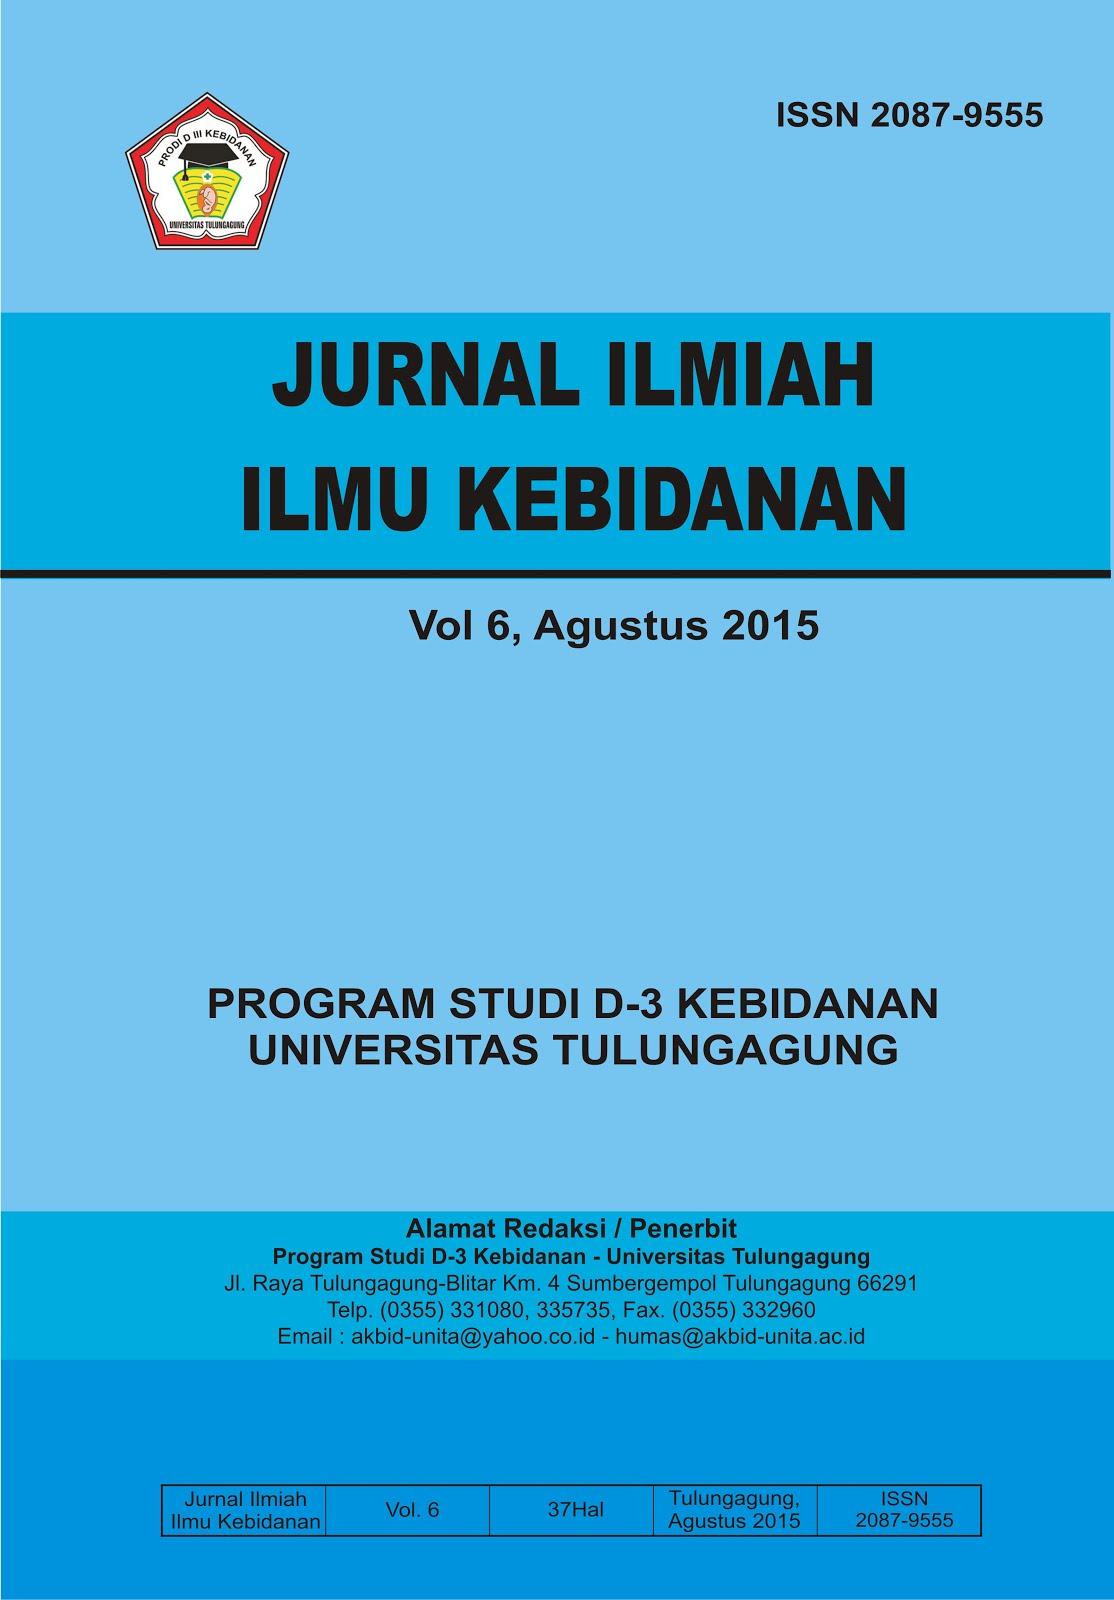 JURNAL ILMIAH ILMU KEBIDANAN VOL.6